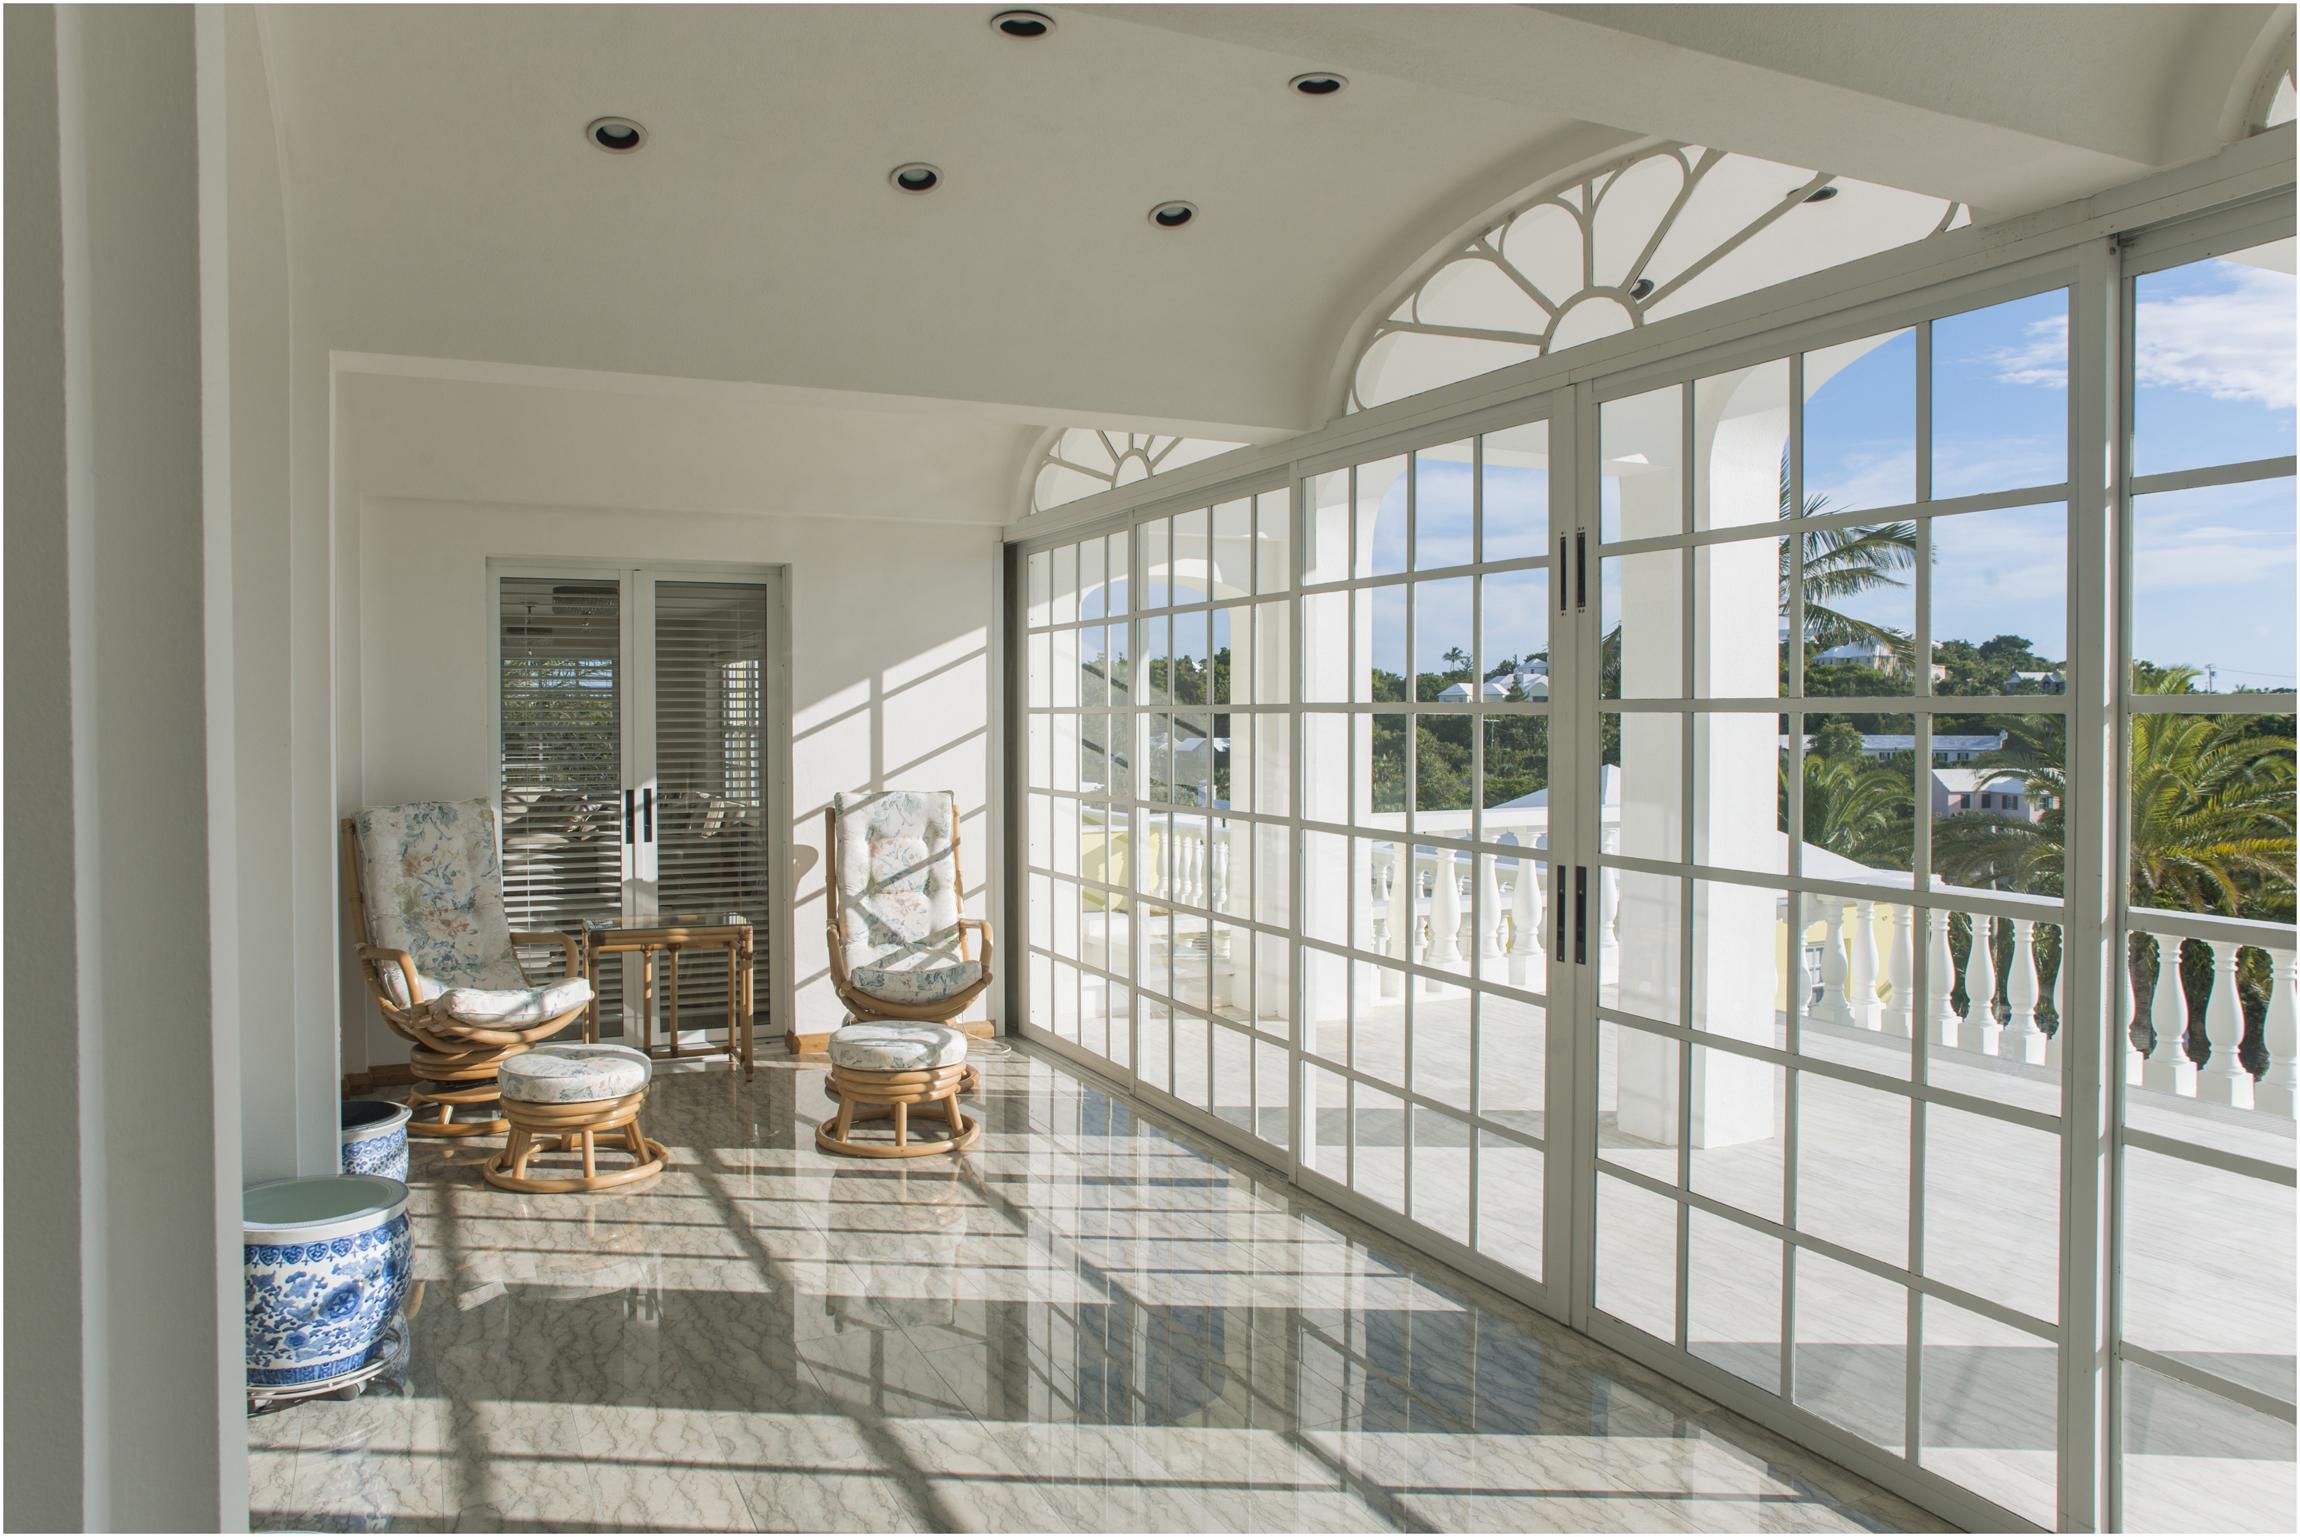 ©FianderFoto_Architecture_Bermuda_Palomera_009.jpg